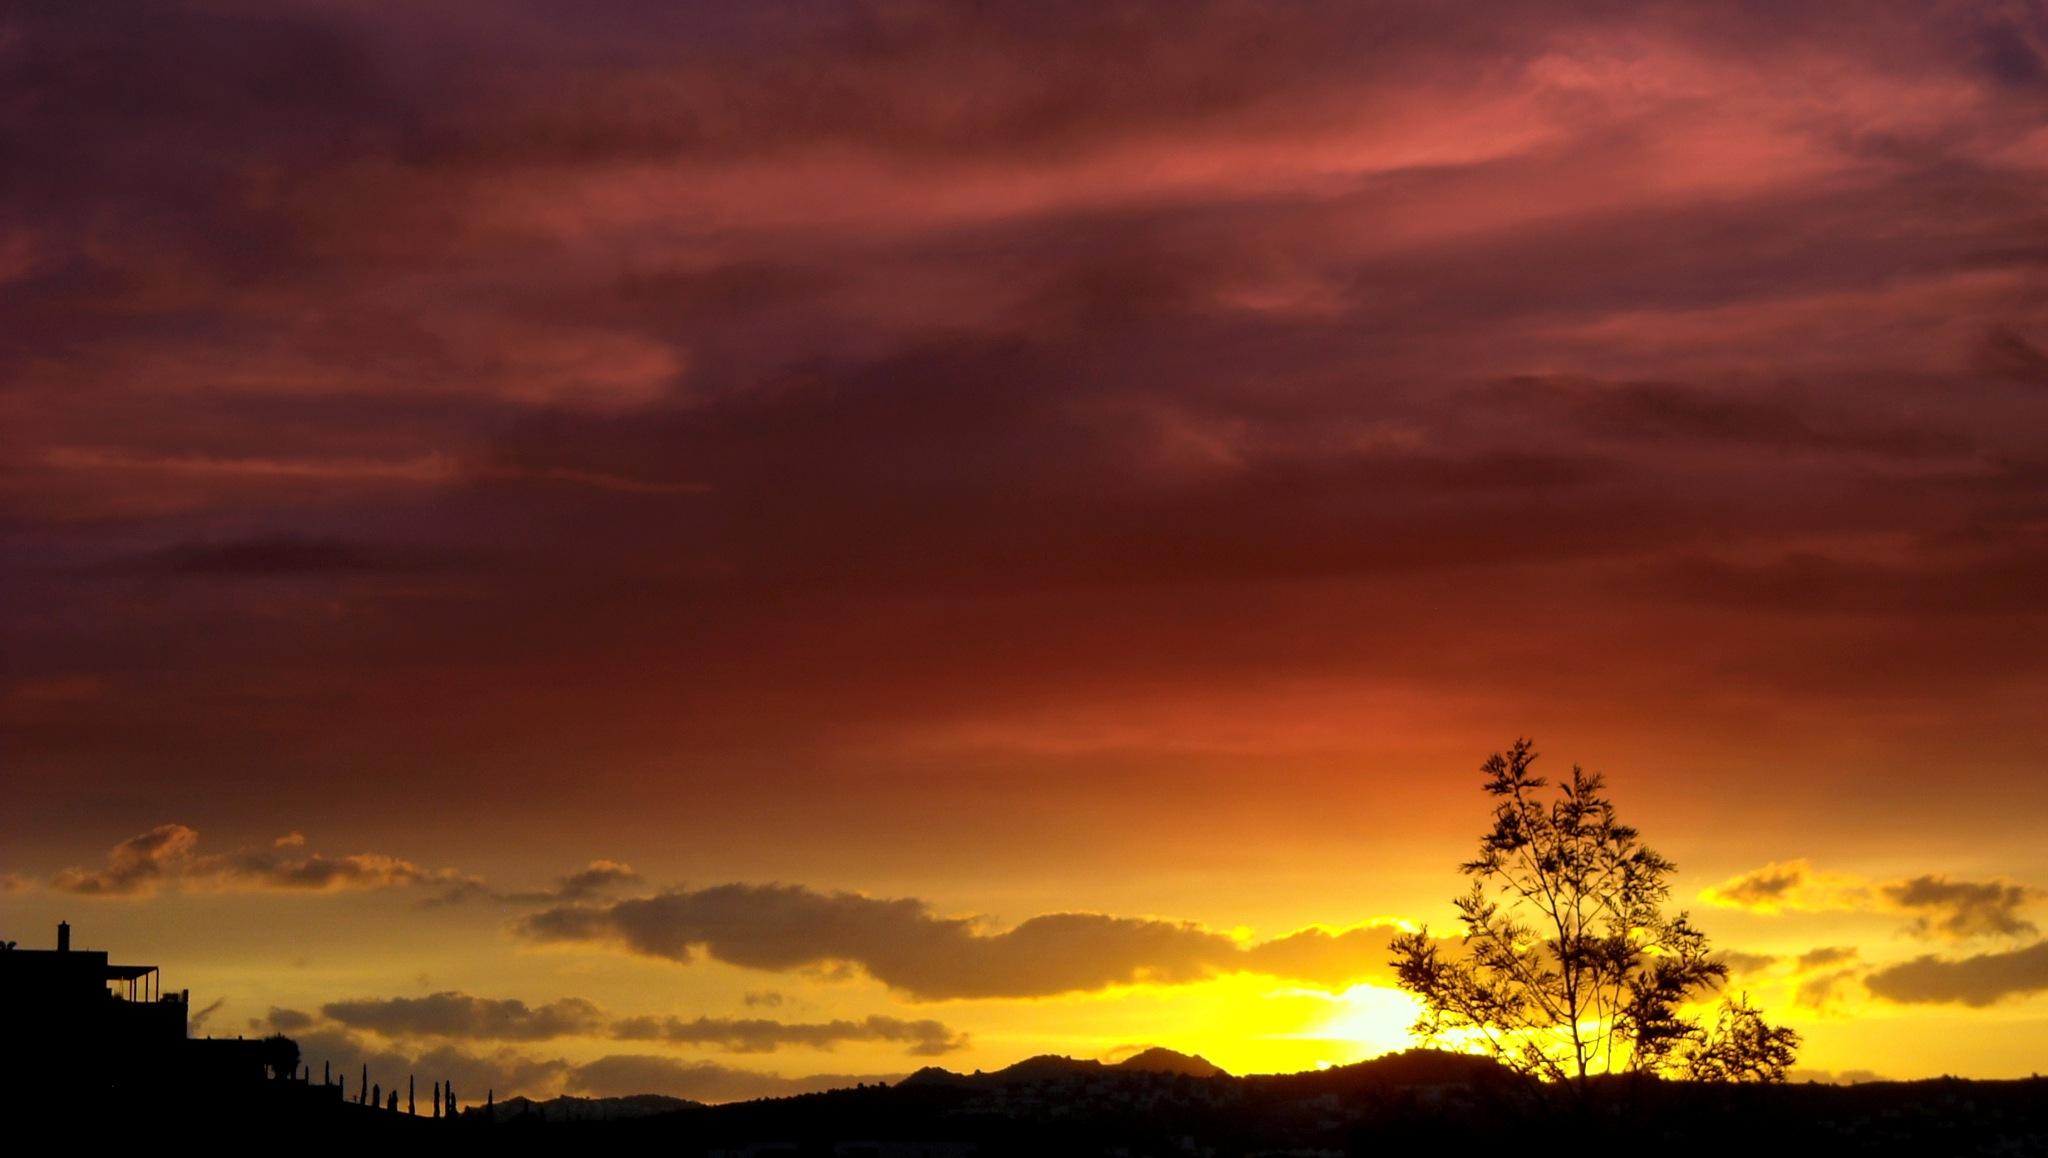 FORGOTTEN SUNSETS 129 by Akin Saner